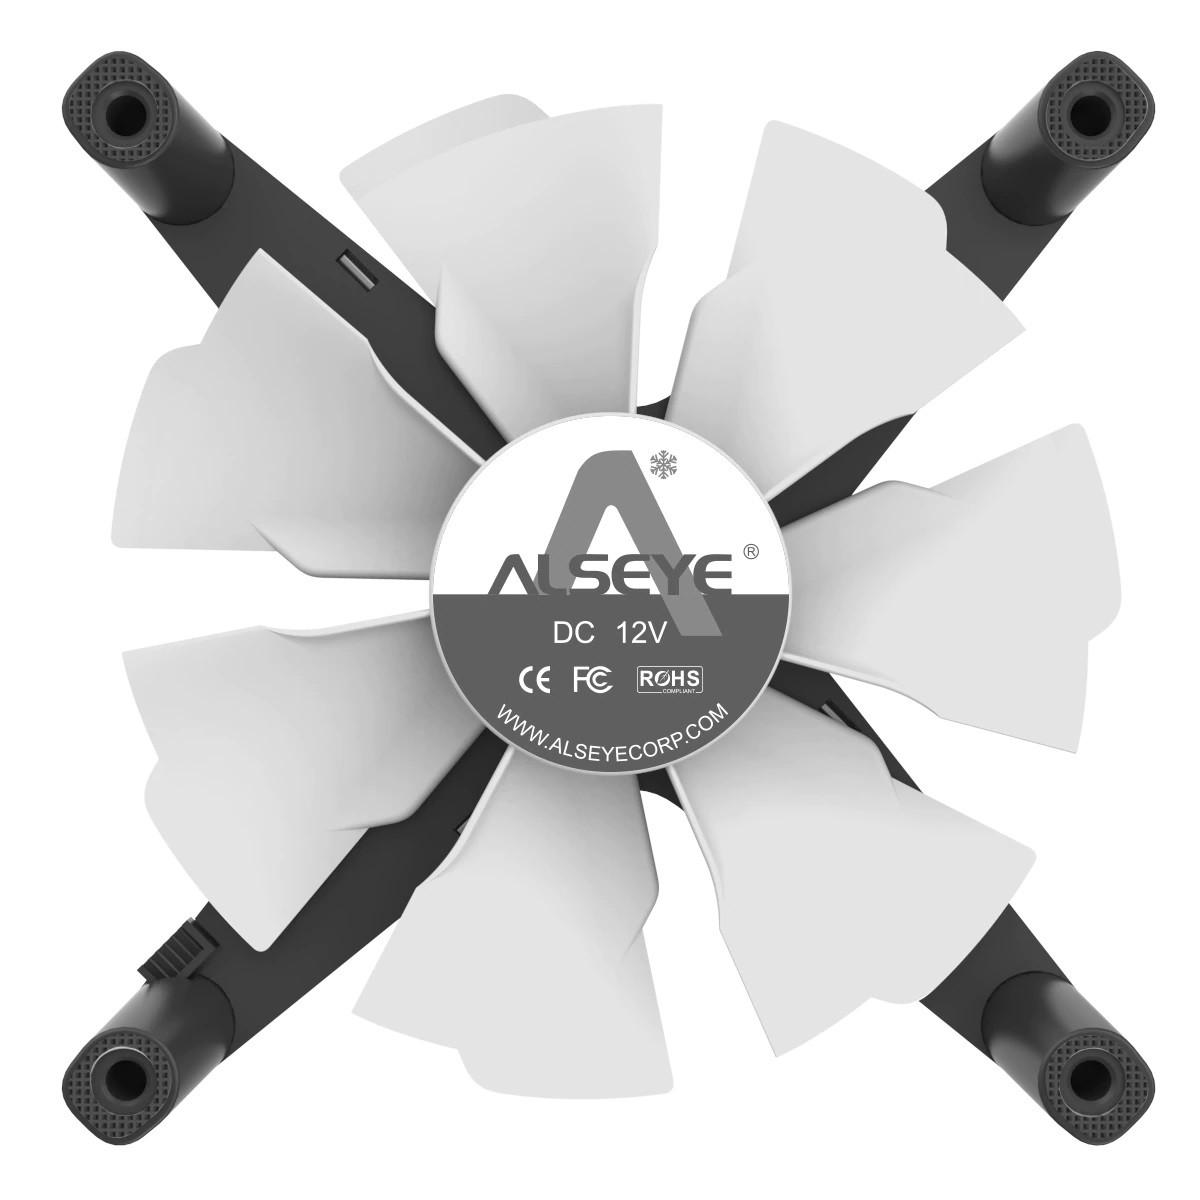 Kit Fan com 3 Unidades Alseye X12, ARGB, Rose Gold, 120mm